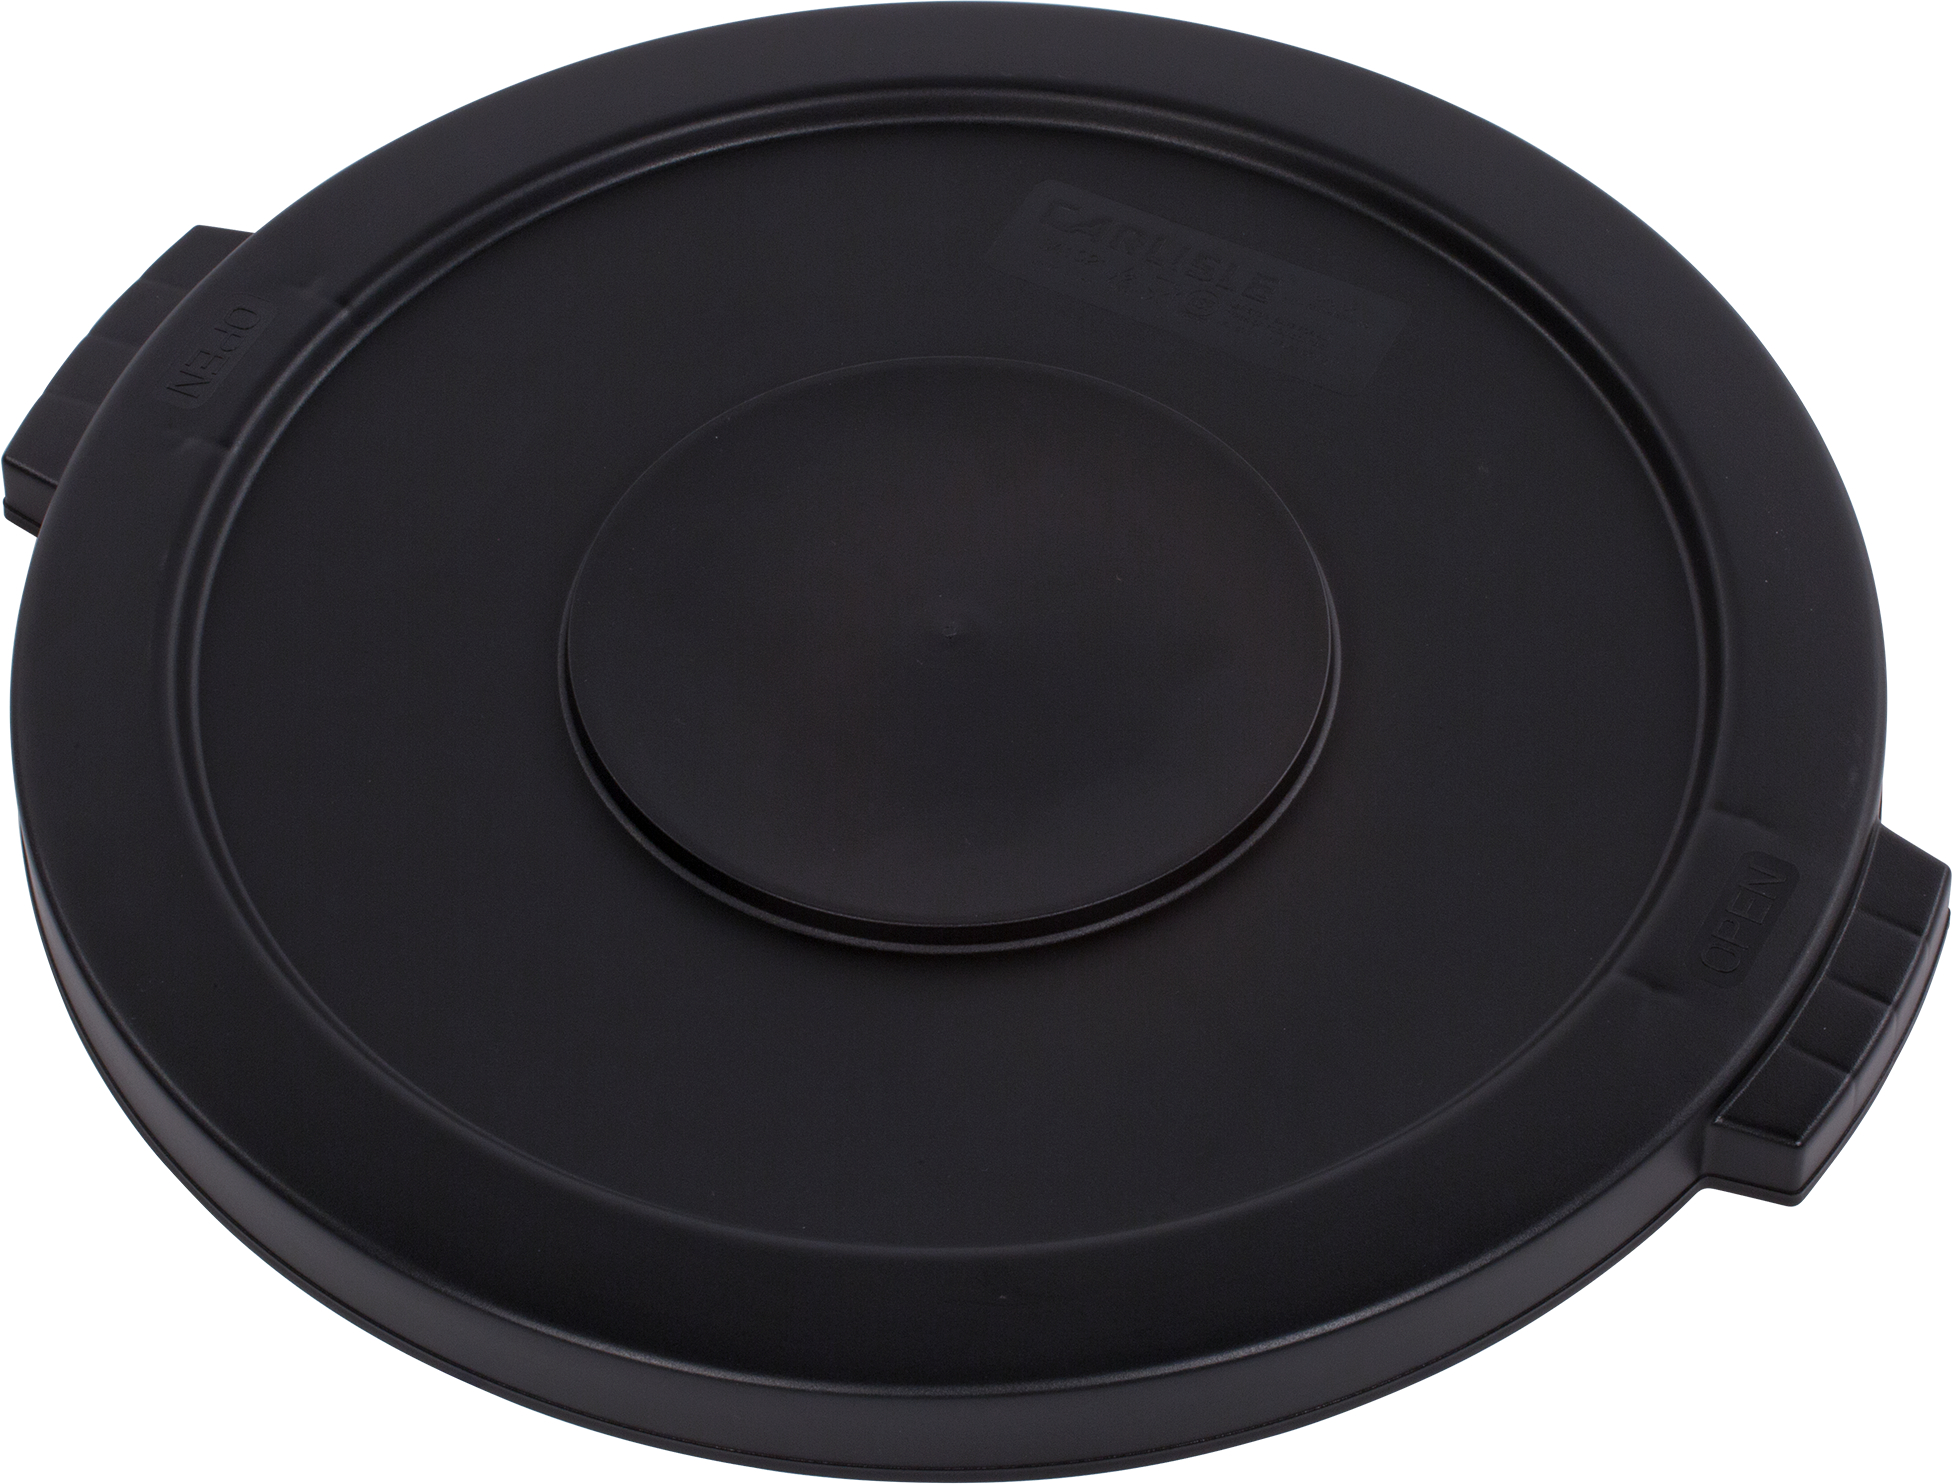 Bronco Round Waste Bin Food Container Lid 20 Gallon - Black